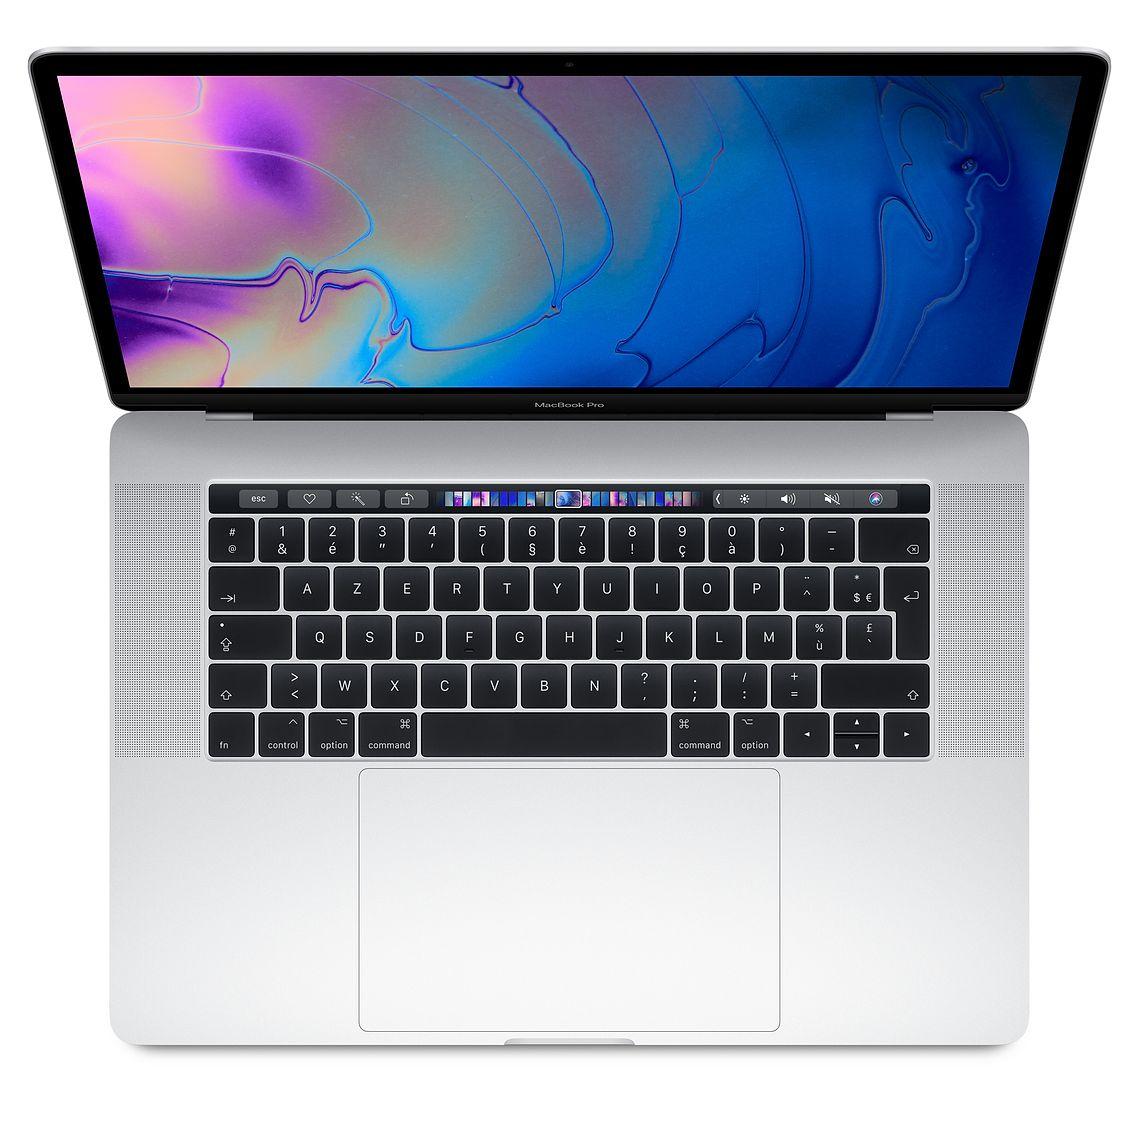 "Ordinateur Portable 15.4"" MacBook Pro Retina Touch Bar - Intel i7, 16 Go RAM, SSD 256 Go, Radeon Pro 555X - 4 Go (Reconditionné)"